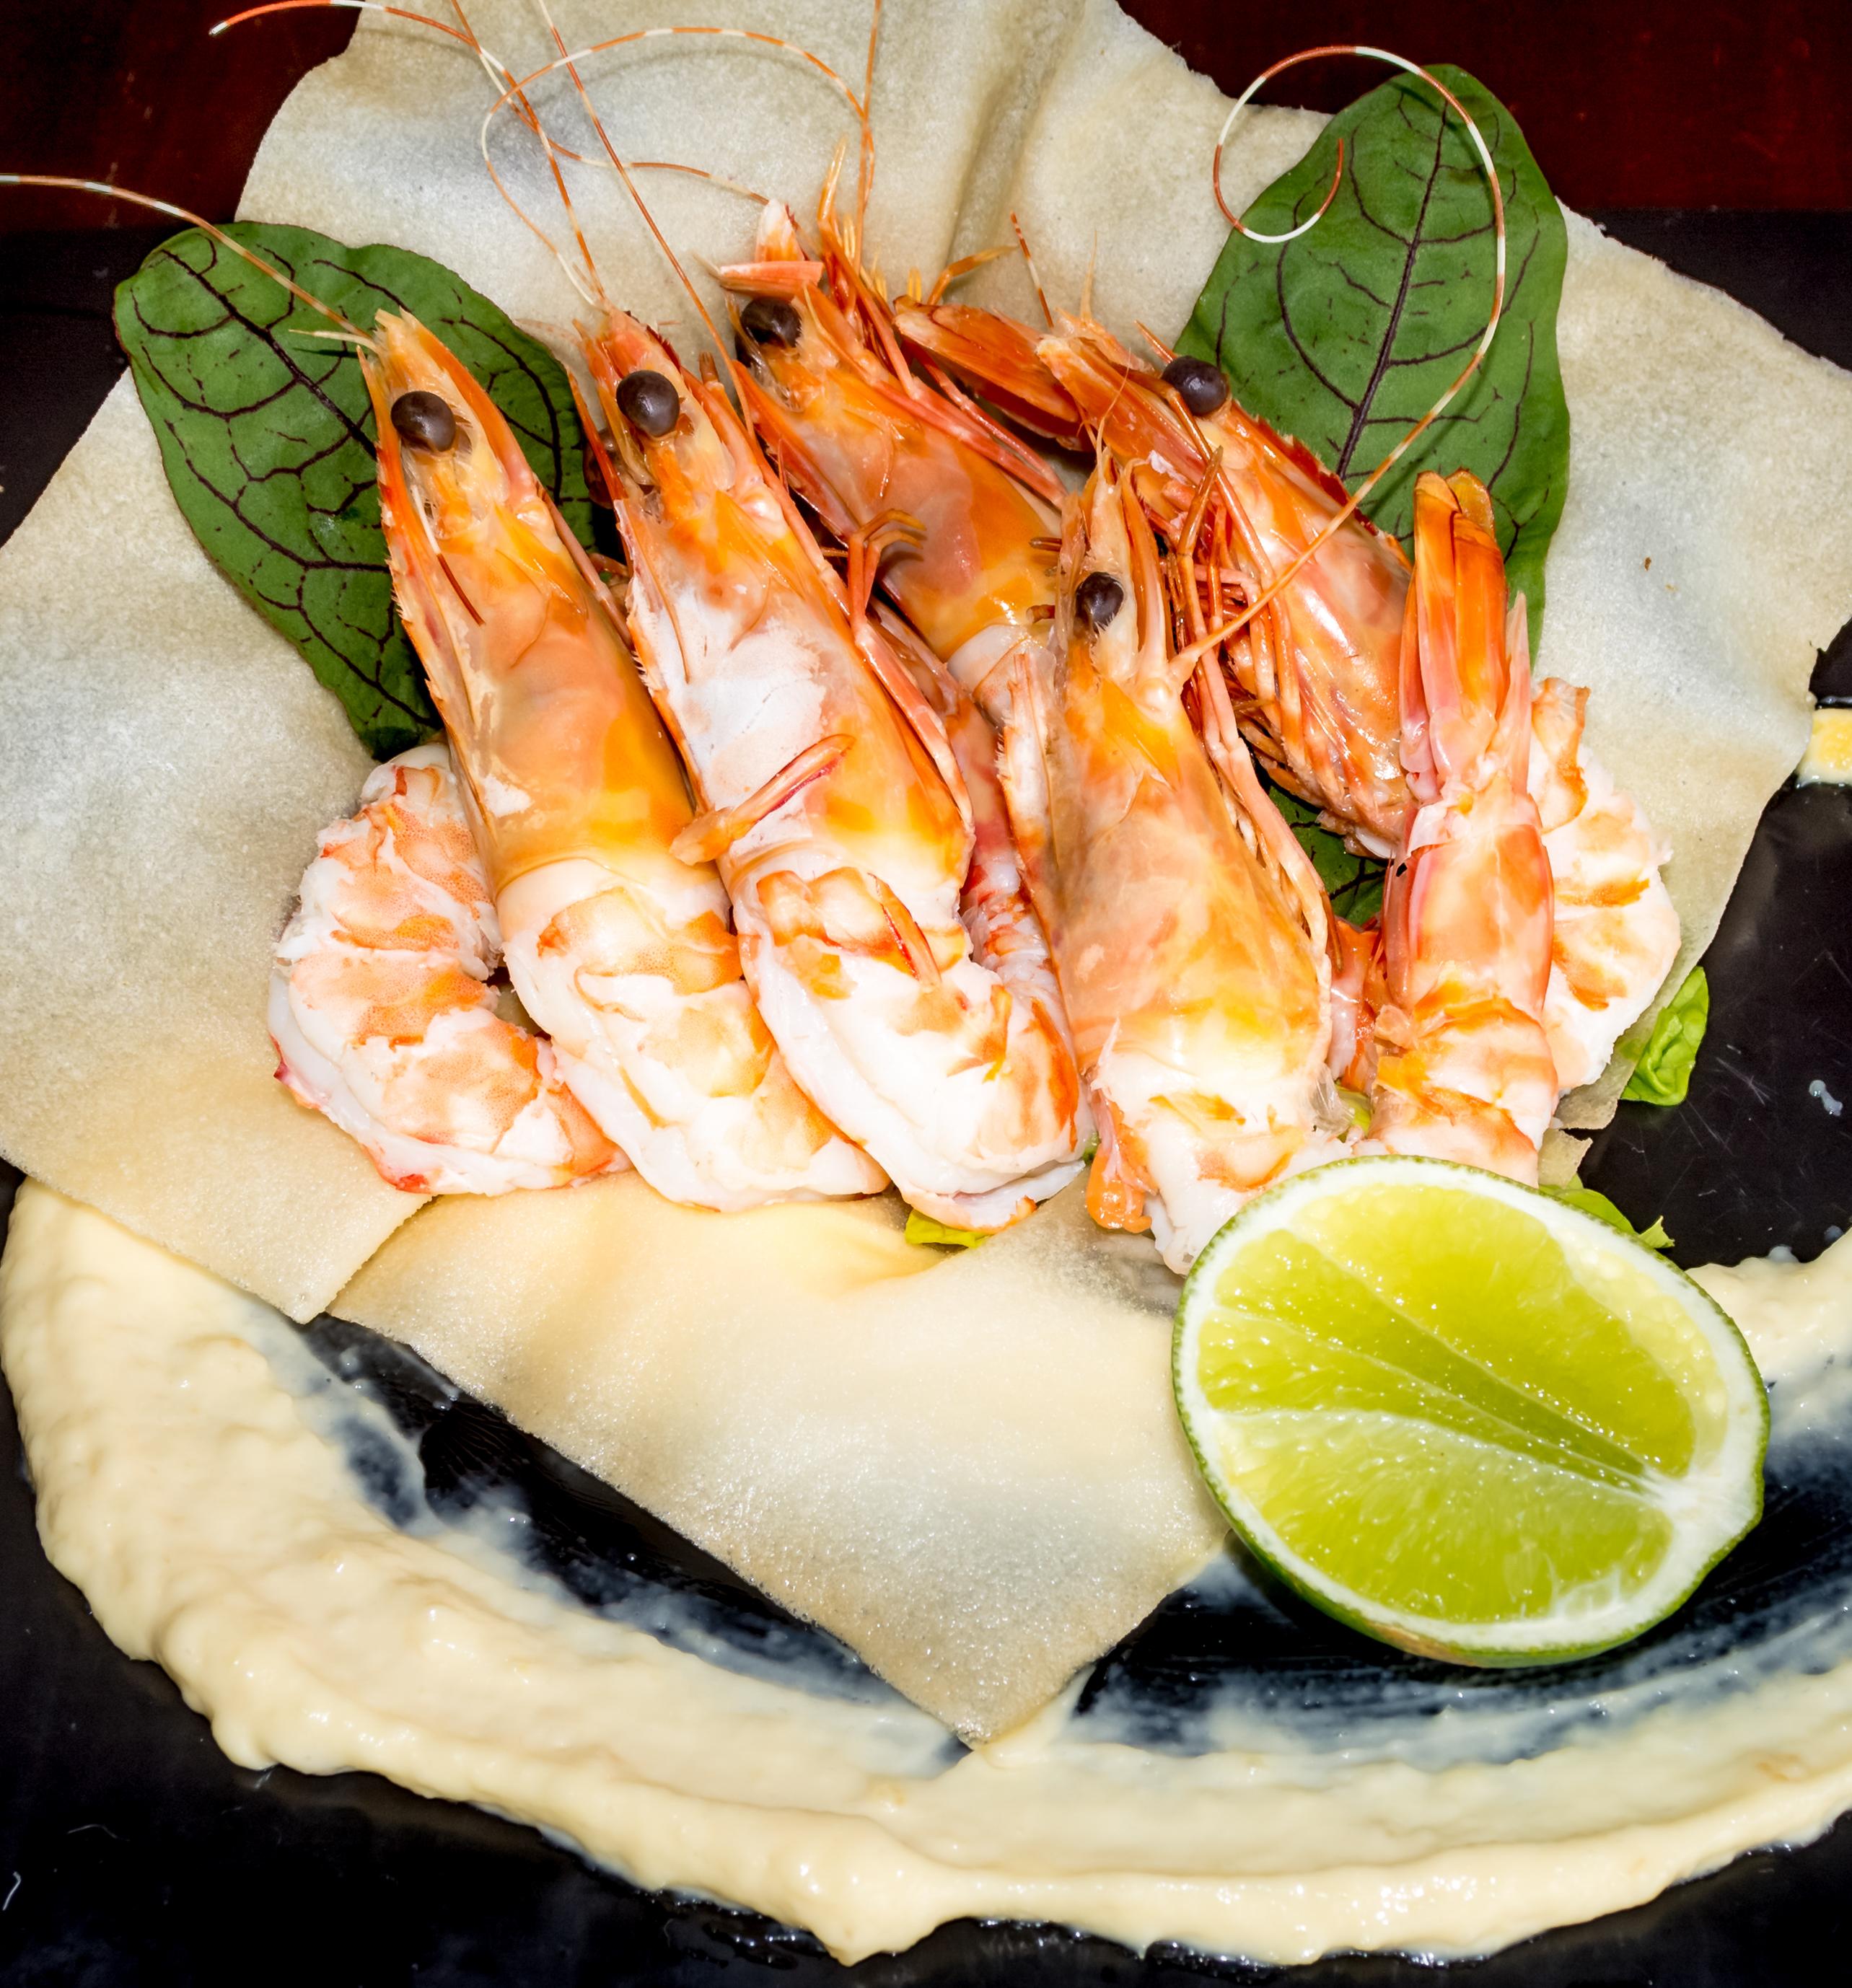 http://www.thalabeach.com.au/wp-content/uploads/2018/01/Ospreys-Restaurant-lunch-7.jpg